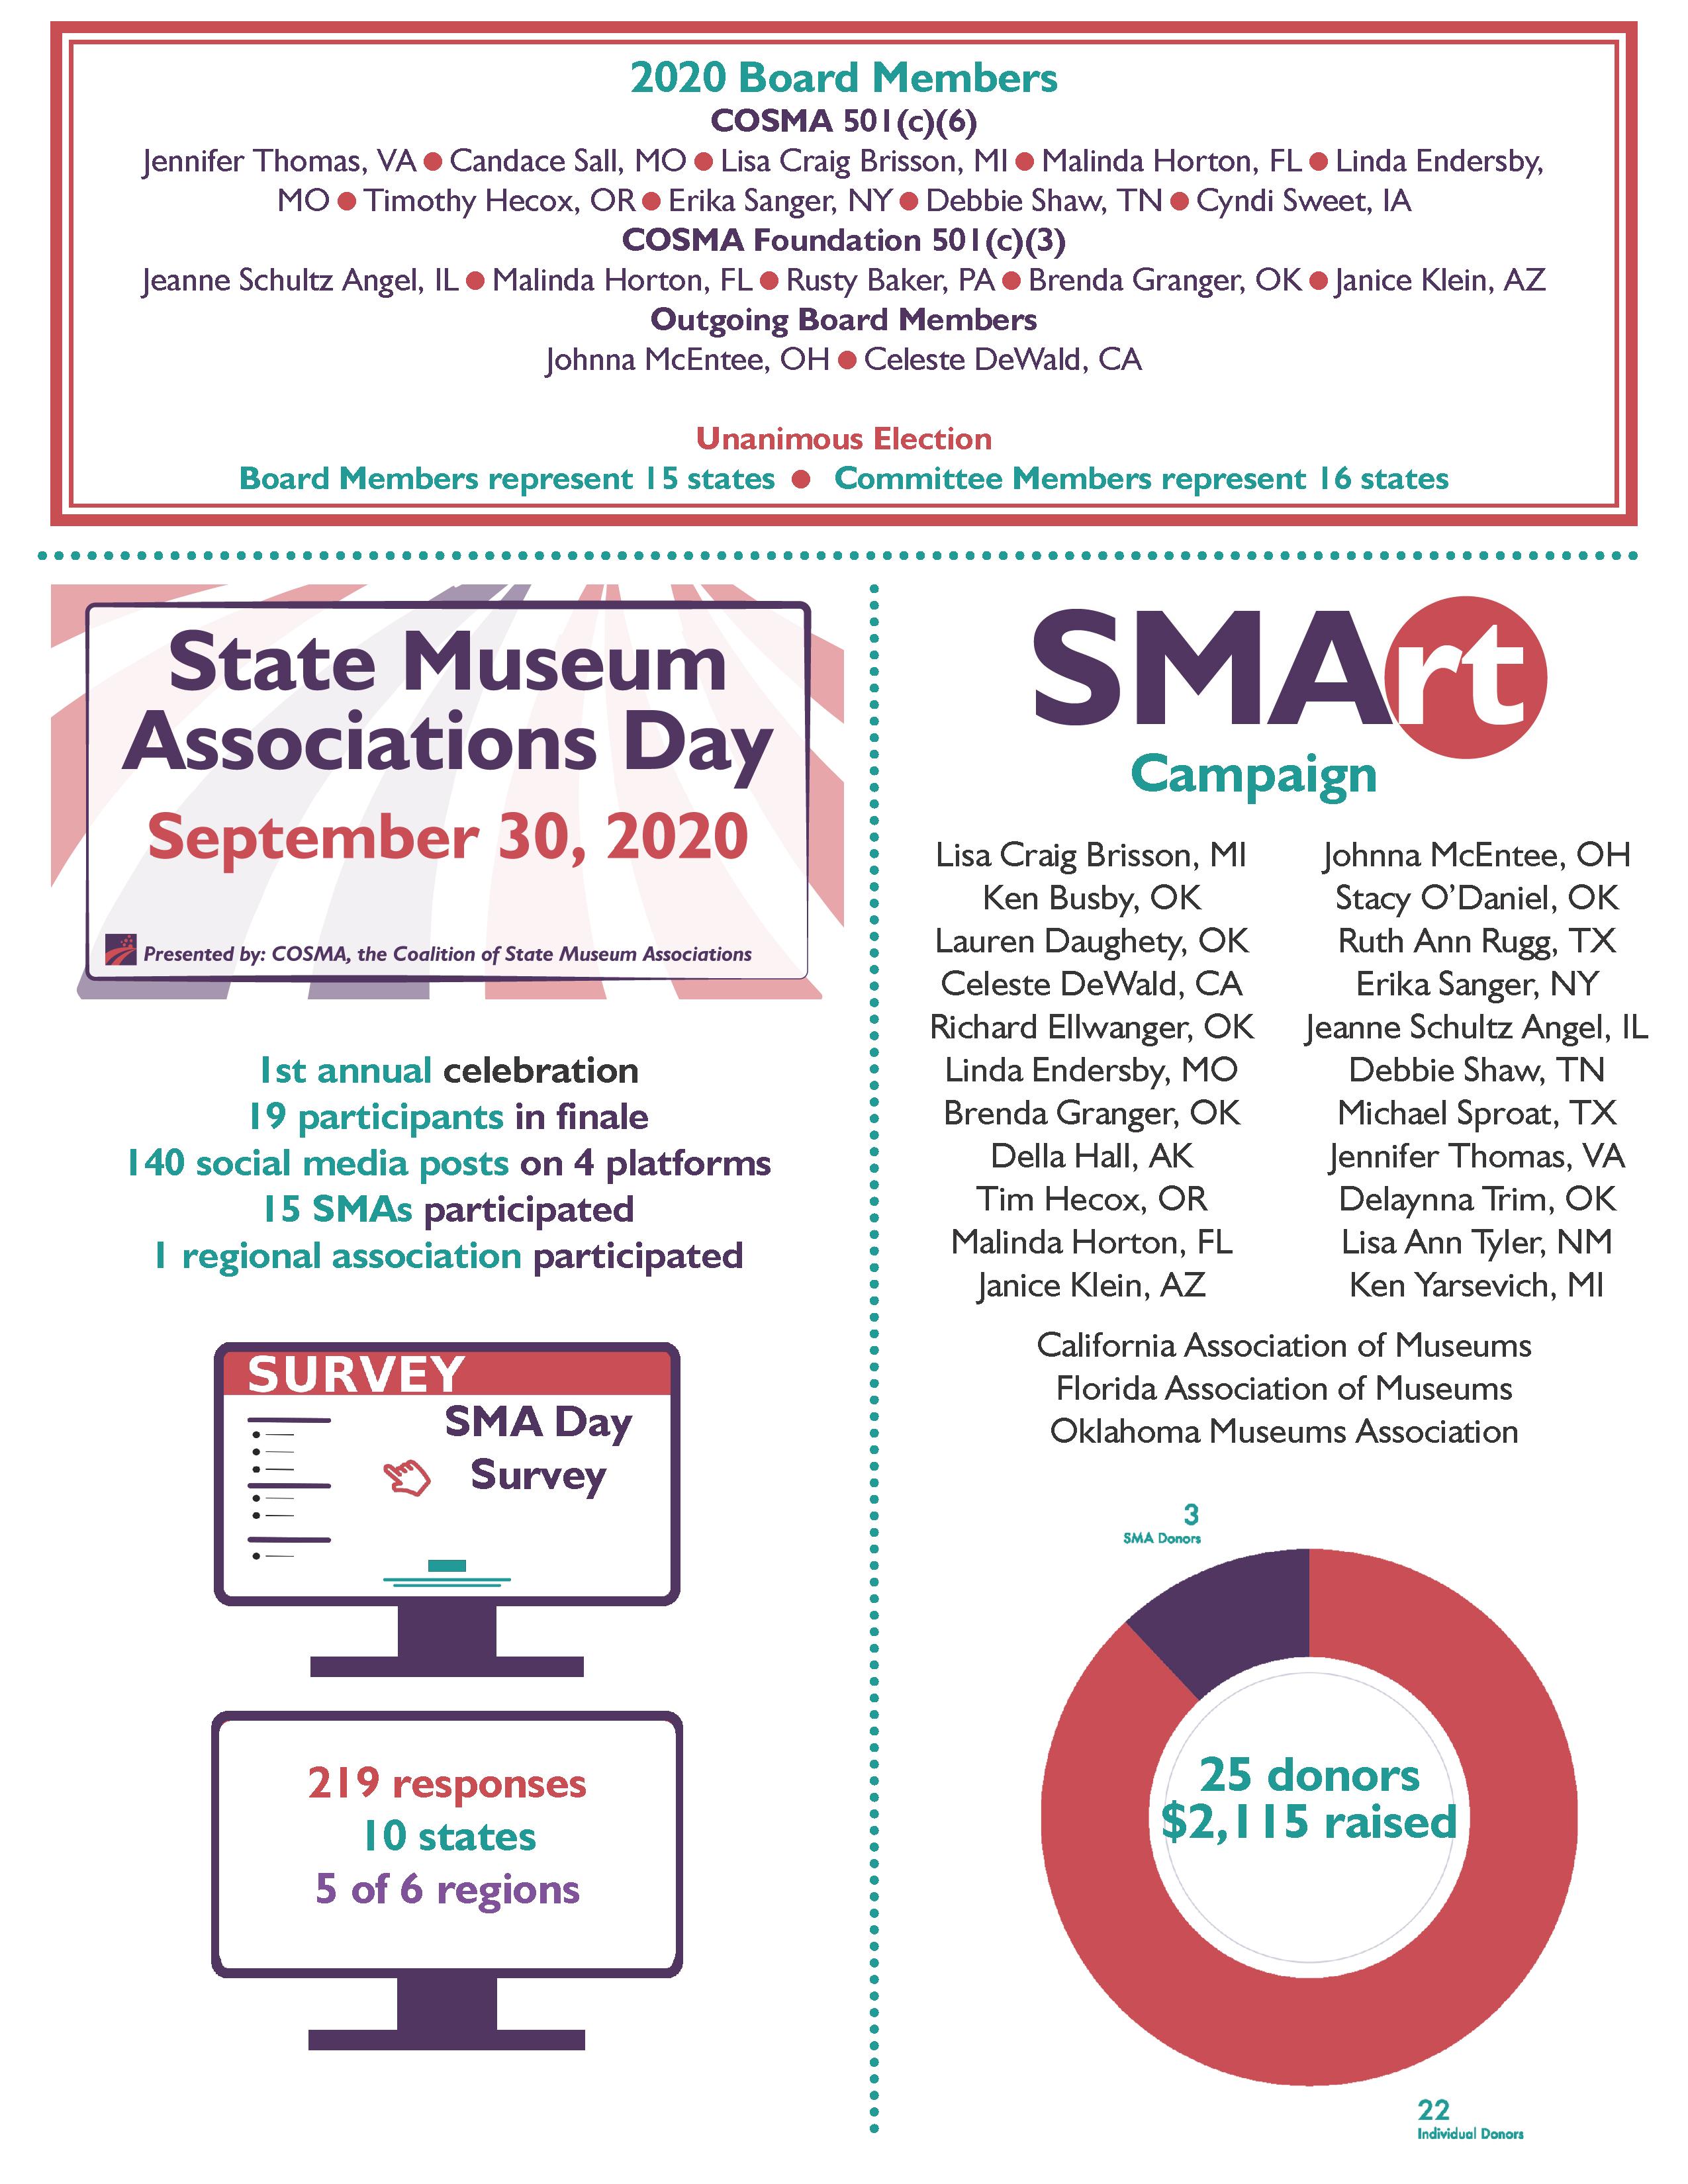 COSMA 2020 Annual Report 5.30.21_Page_2